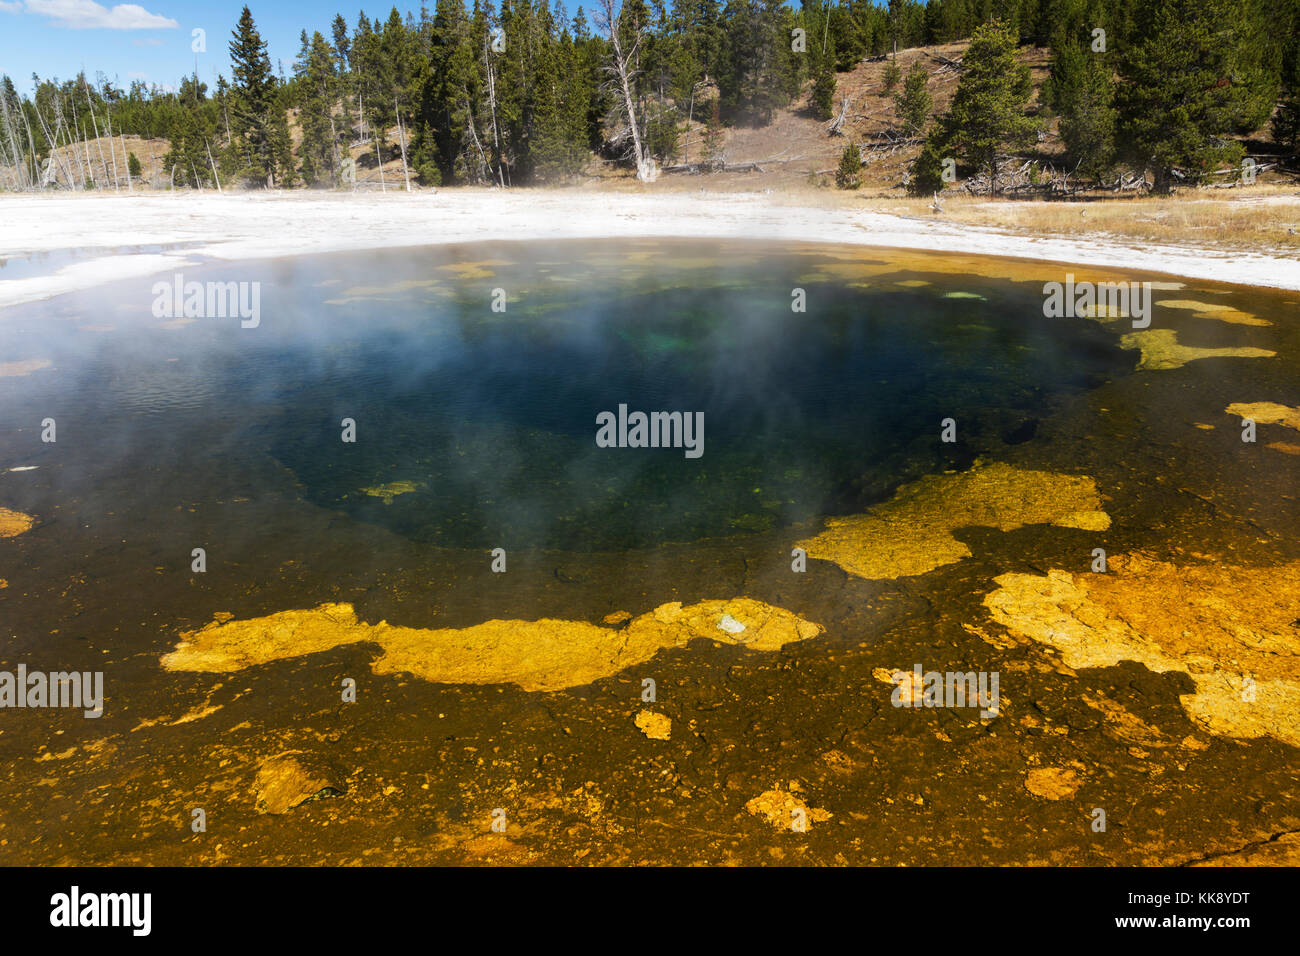 Beauty pool thermische Funktion in der Upper Geyser Basin, Yellowstone National Park Stockbild